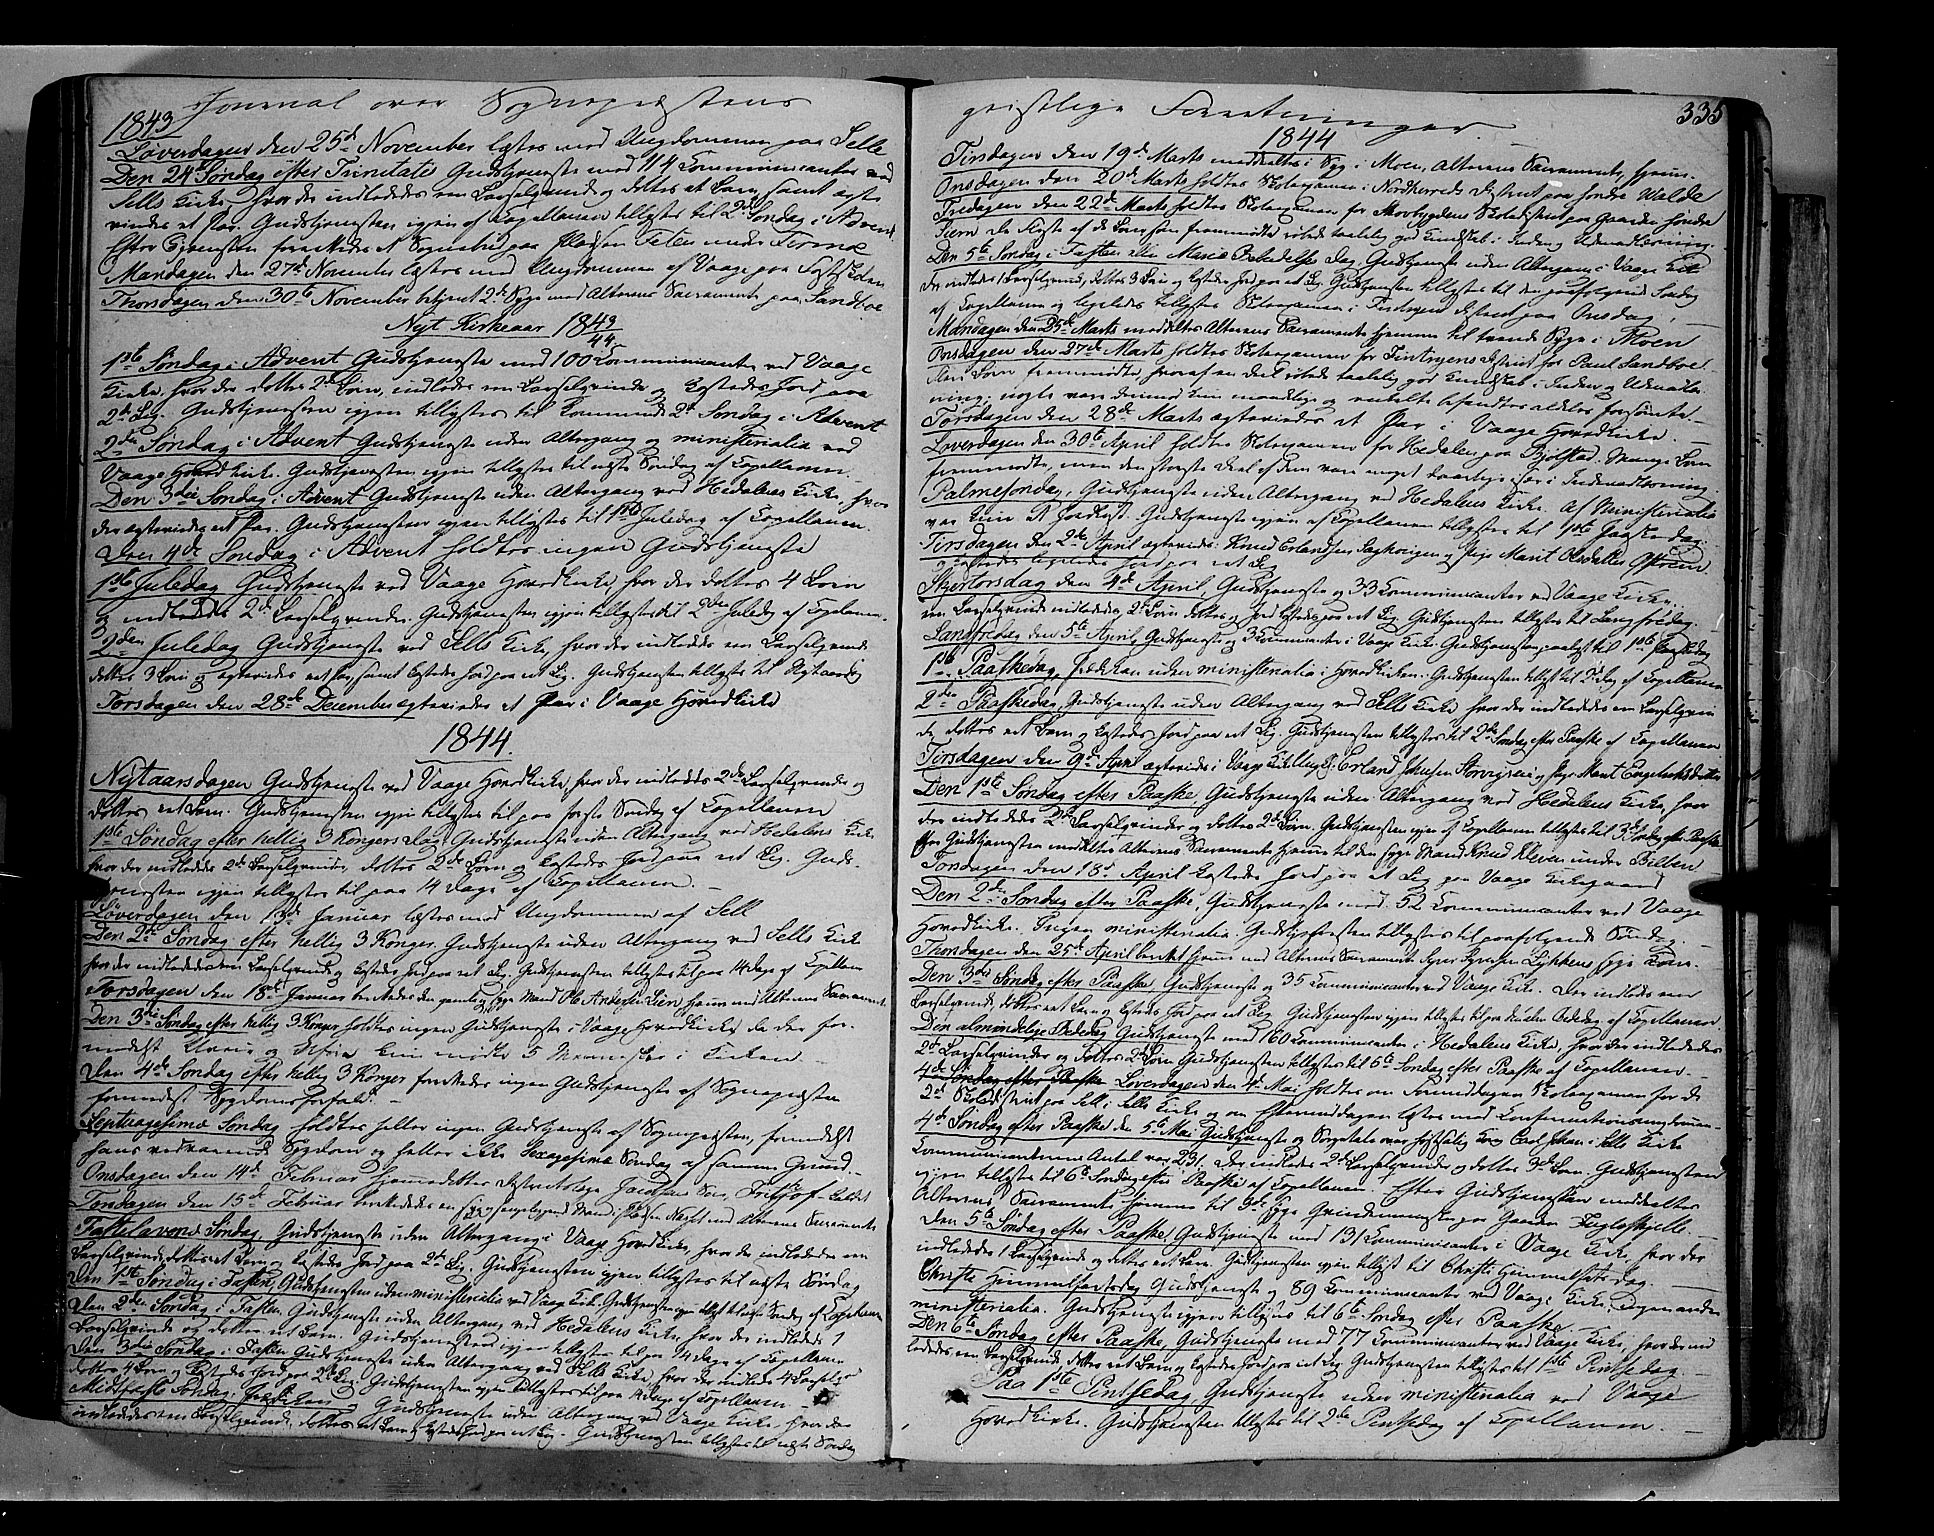 SAH, Vågå prestekontor, Ministerialbok nr. 5 /1, 1842-1856, s. 335